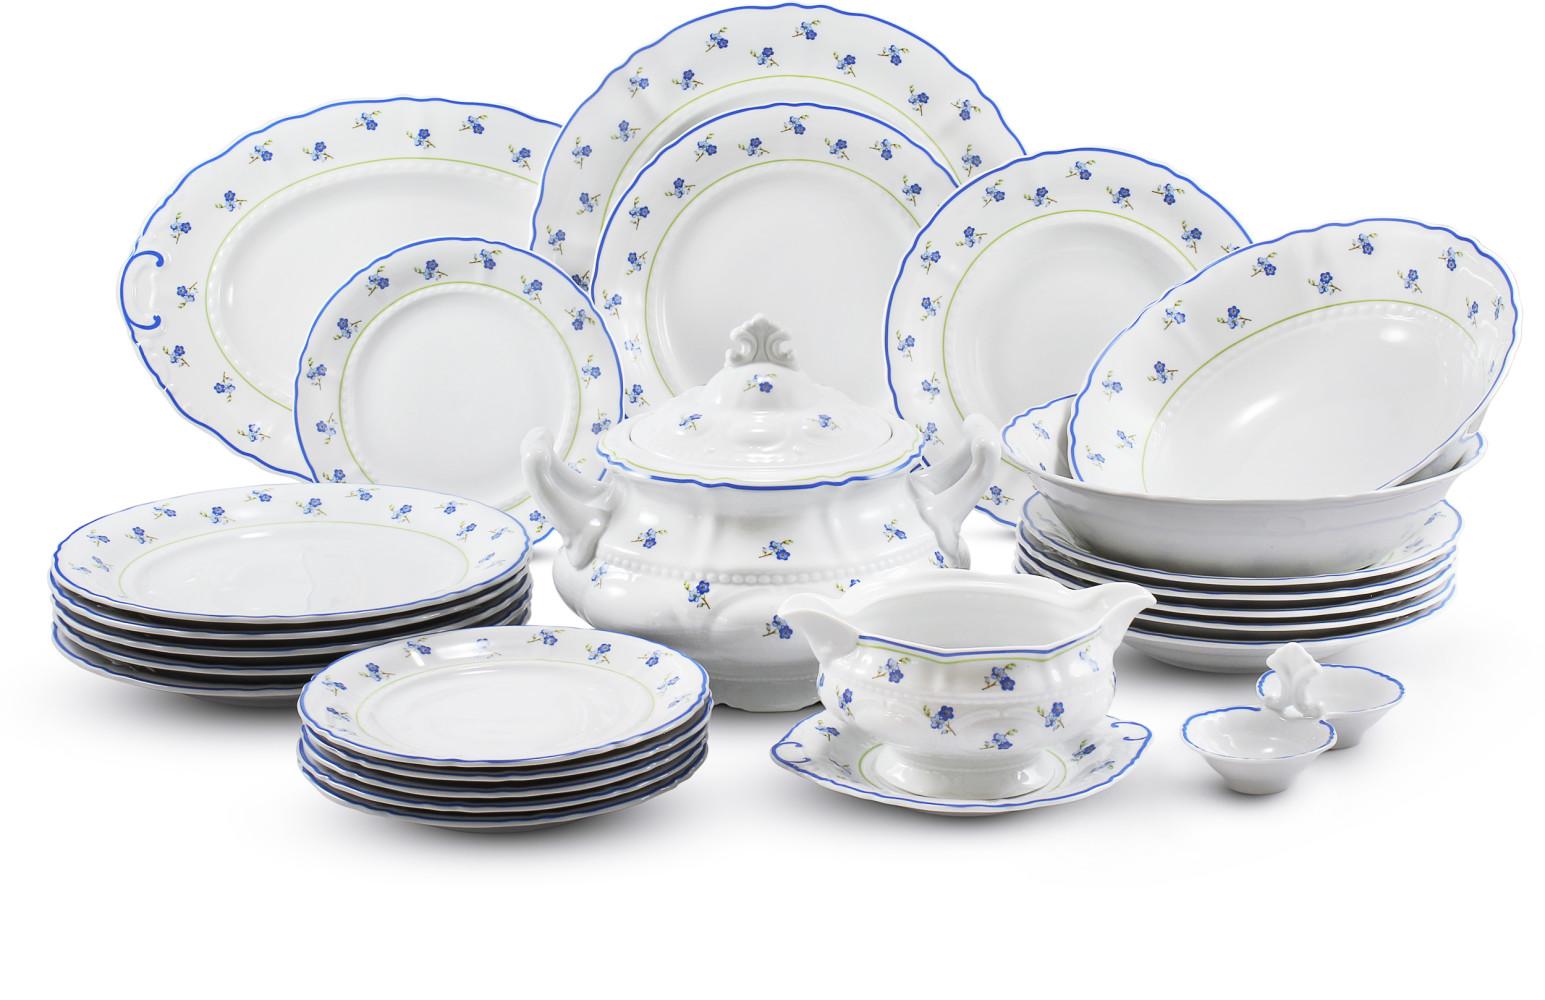 Dinner set 25-piece Forget-me-nots